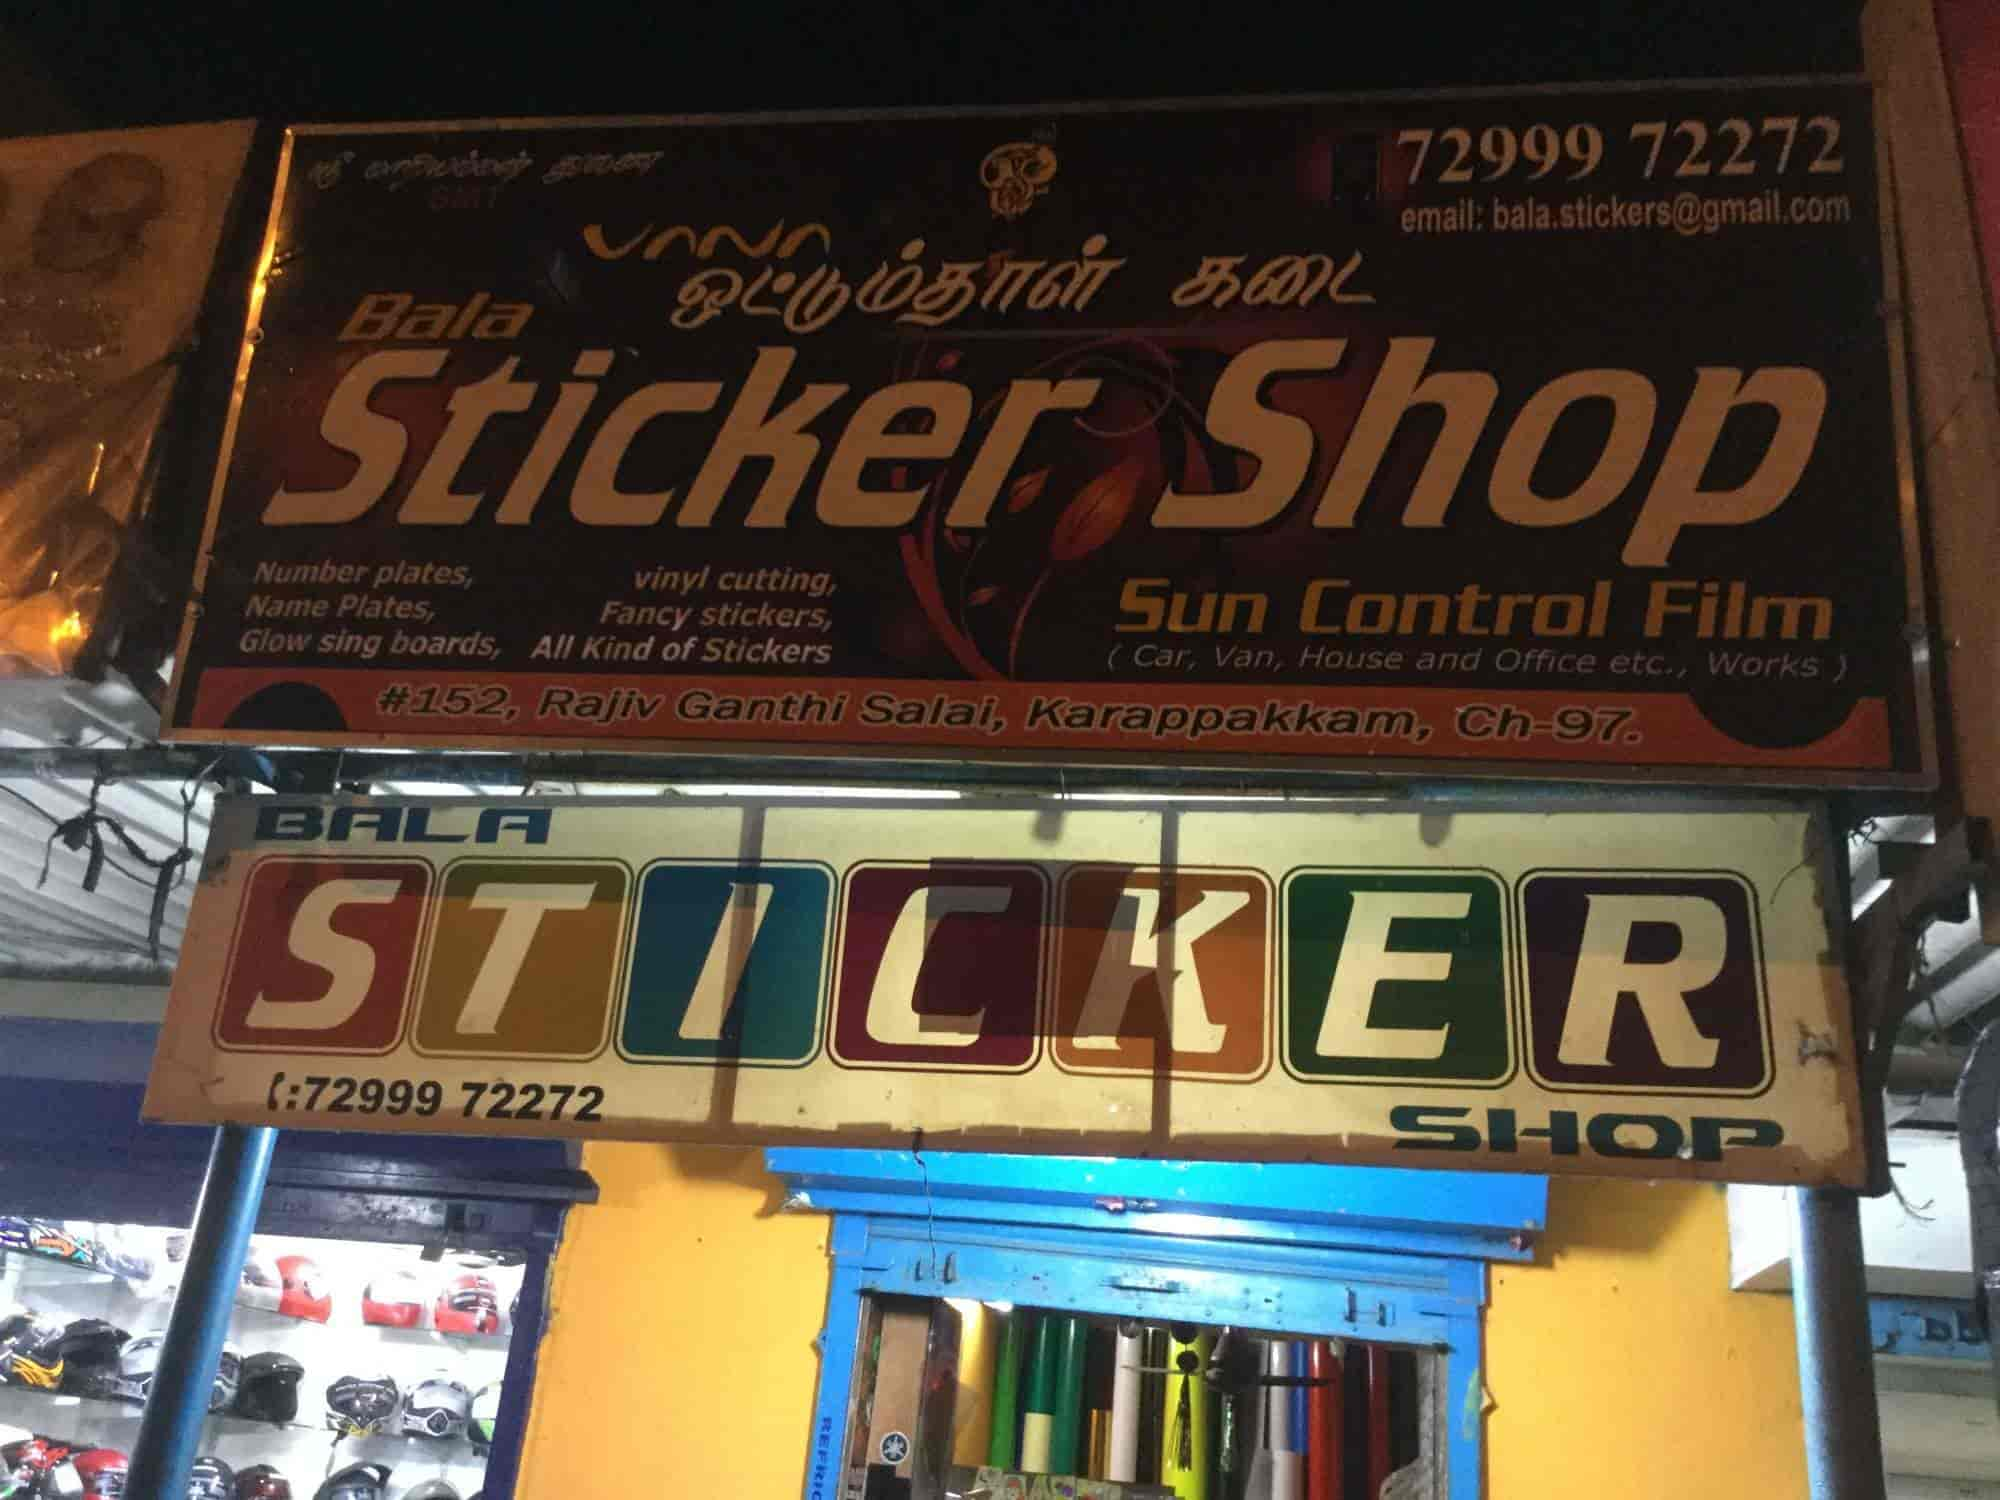 Bala sticker shop karapakkam sticker dealers in chennai justdial